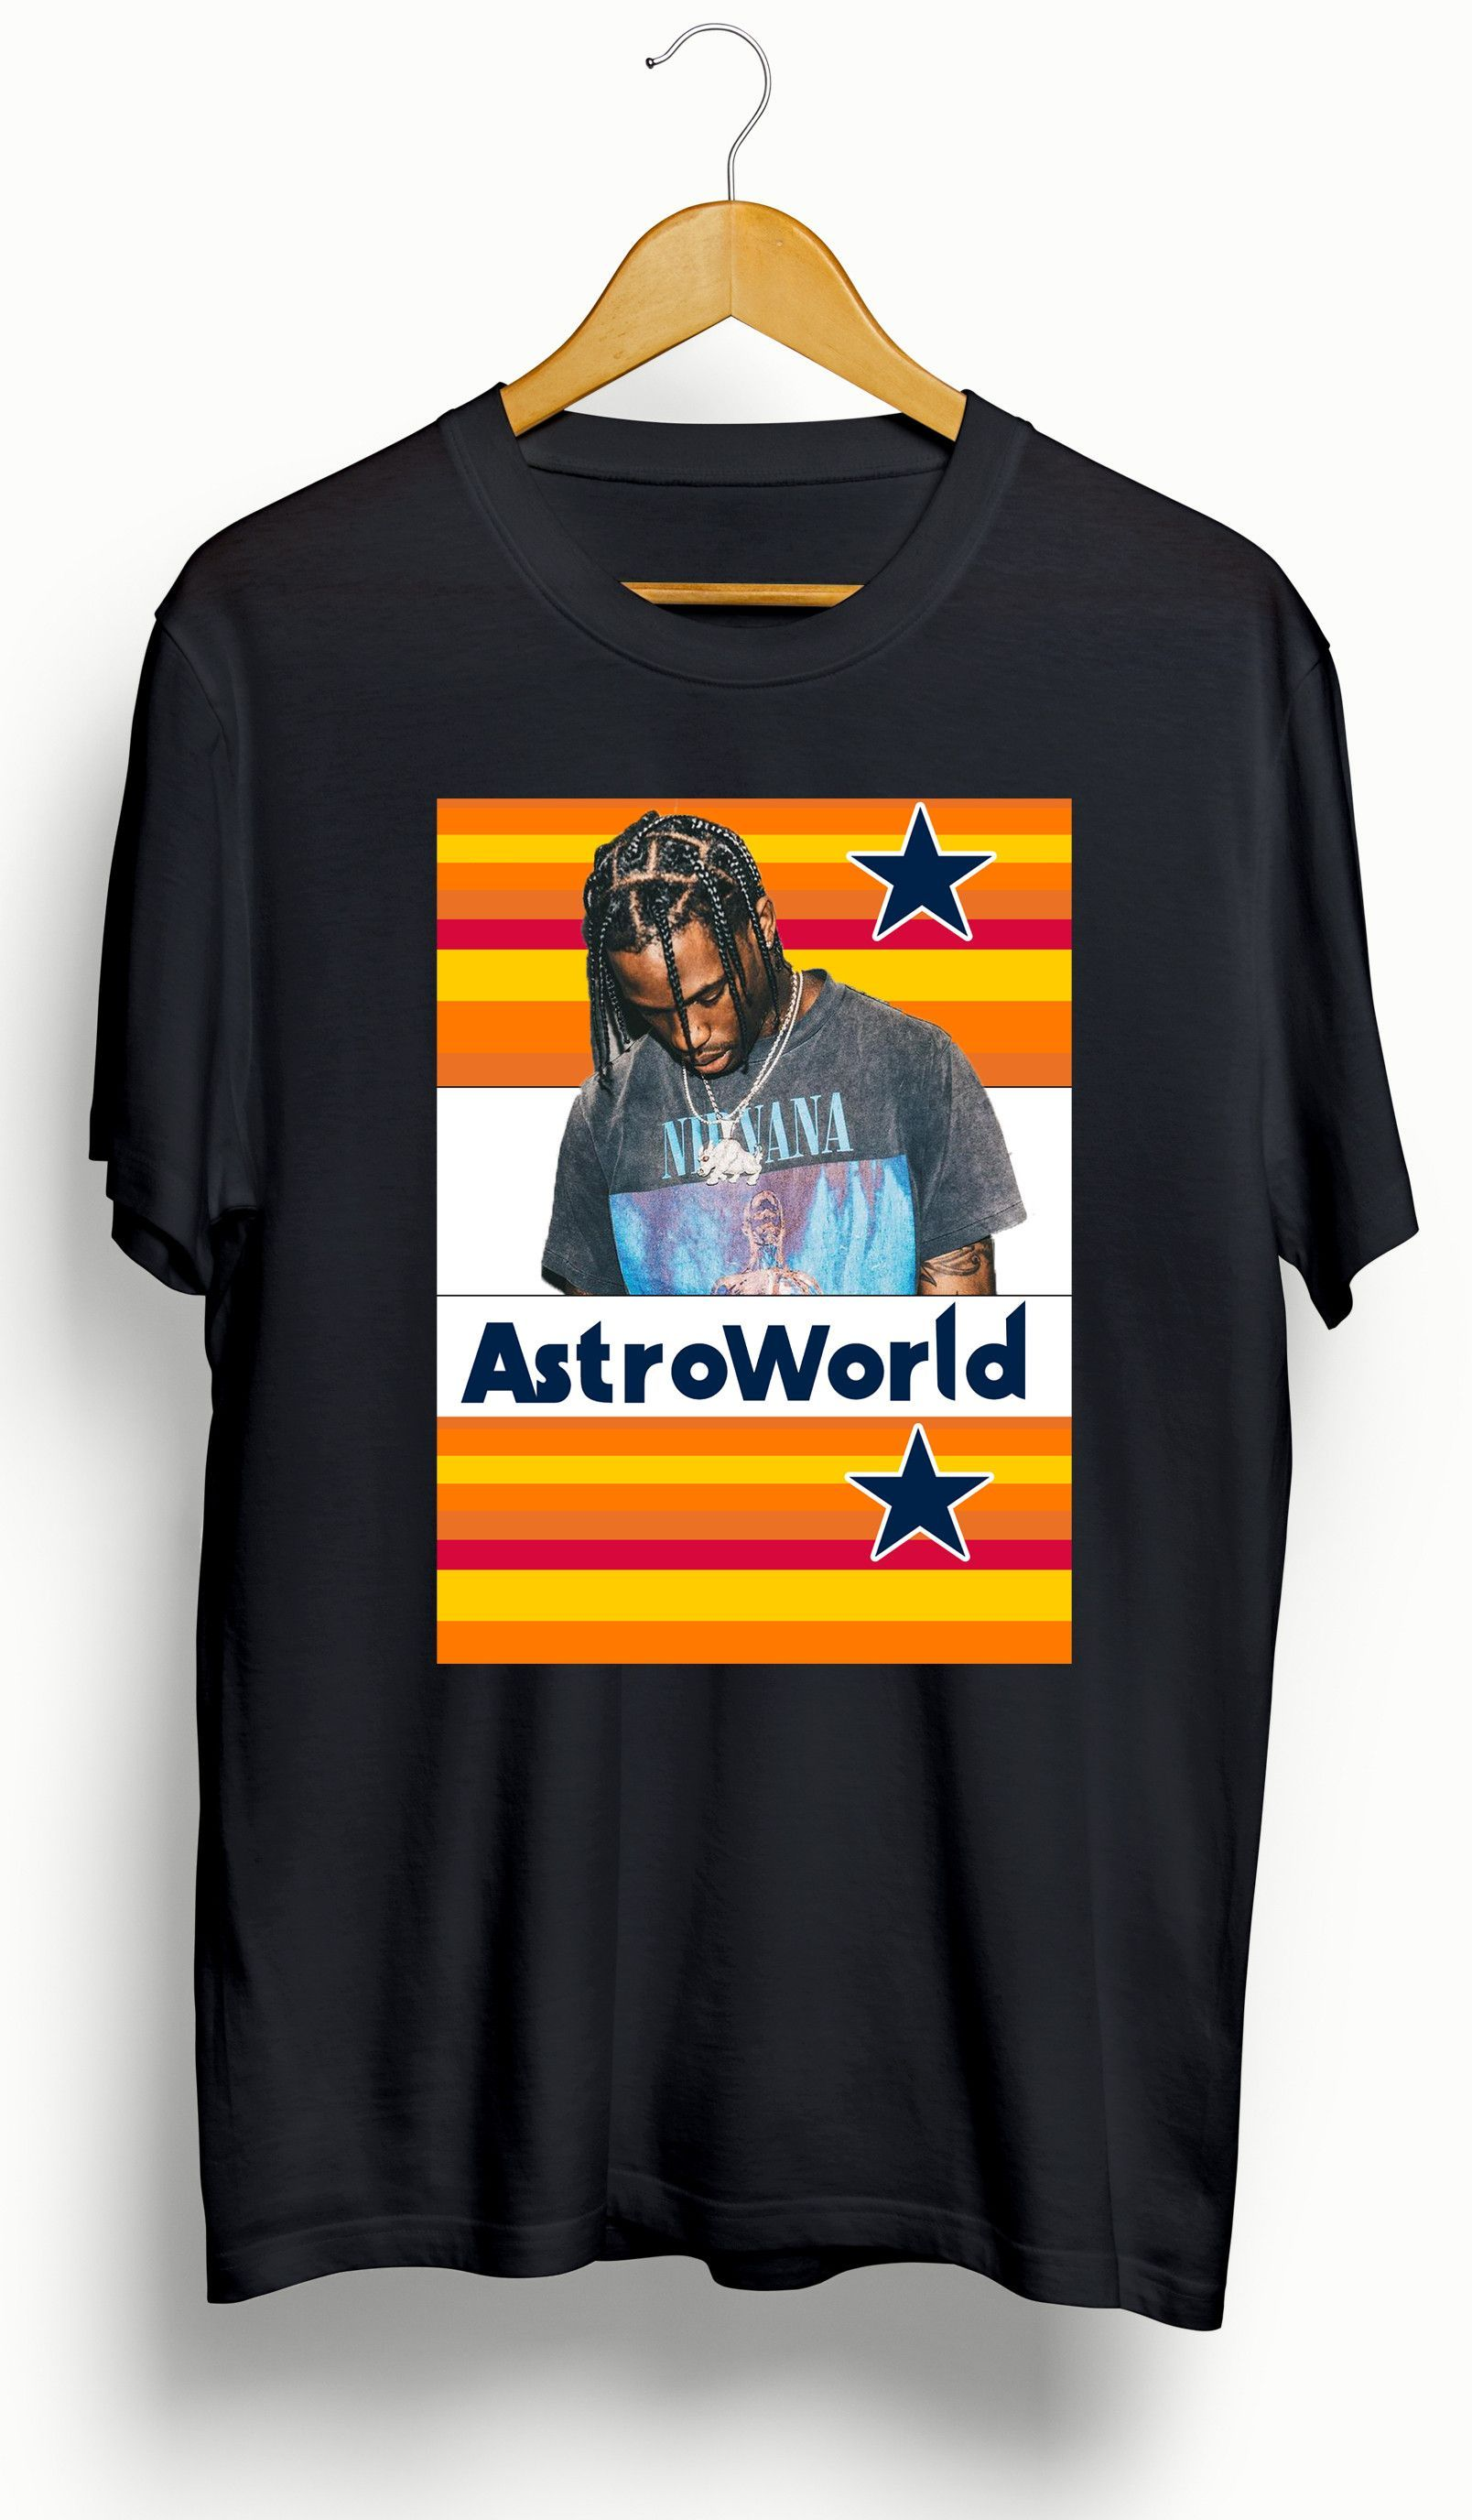 eaca0ec3967f6d Travis Scott Astroworld T-Shirt in 2019